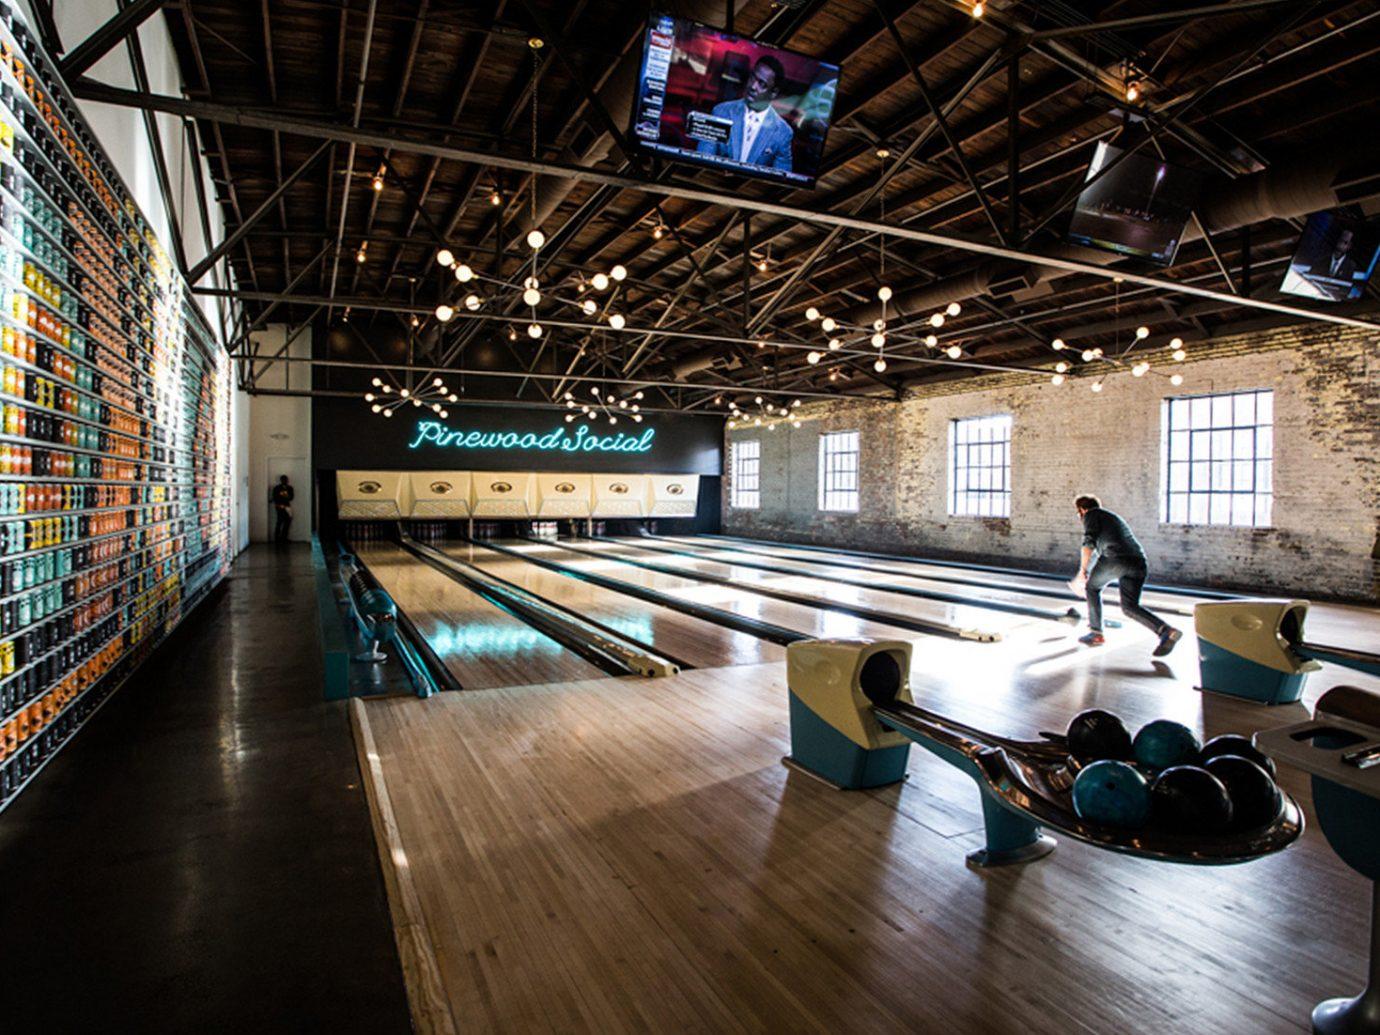 Girls Getaways Jetsetter Guides Trip Ideas Weekend Getaways indoor floor ten pin bowling ceiling sports bowling sport venue platform station public transport subway